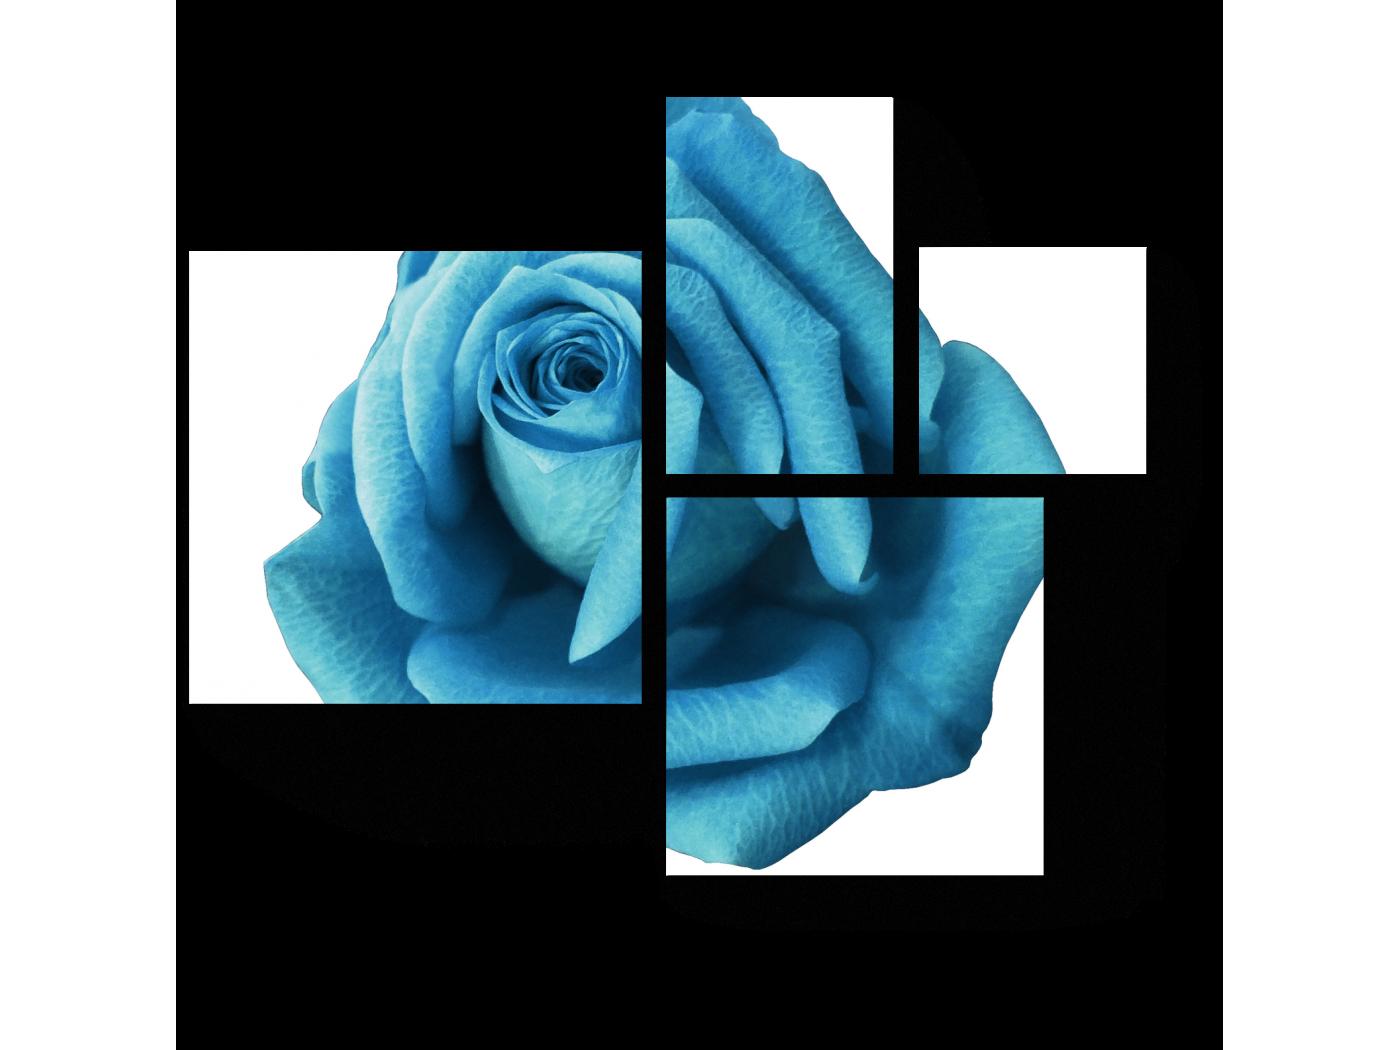 Модульная картина Голубая роза (72x60) фото